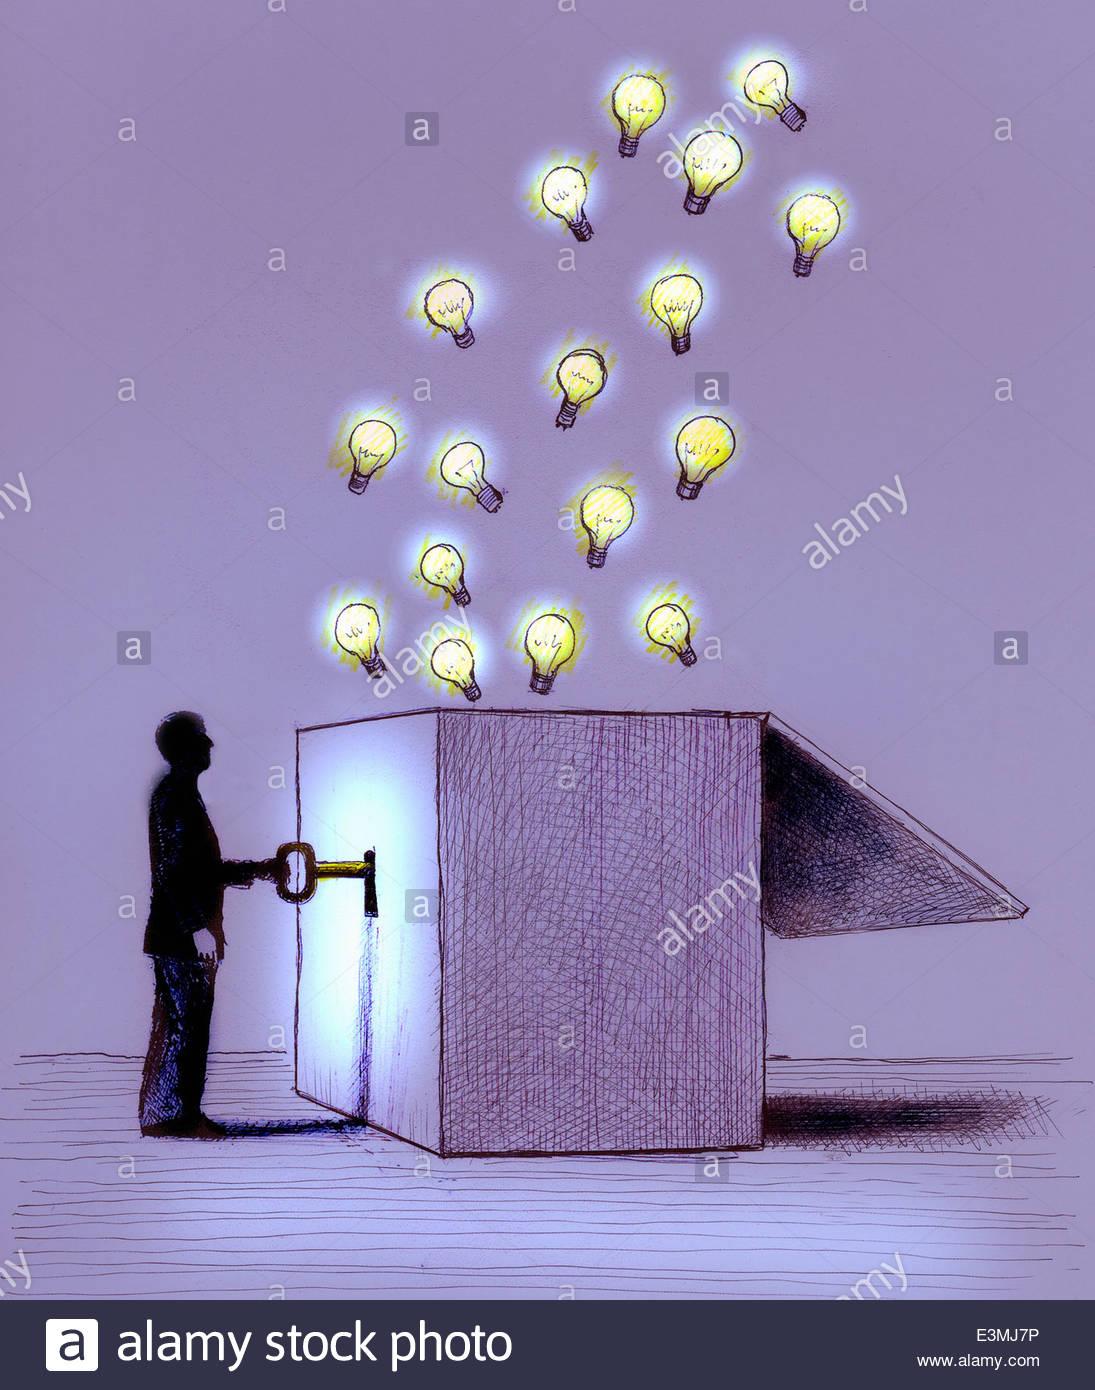 Man unlocking illuminated light bulbs from box - Stock Image